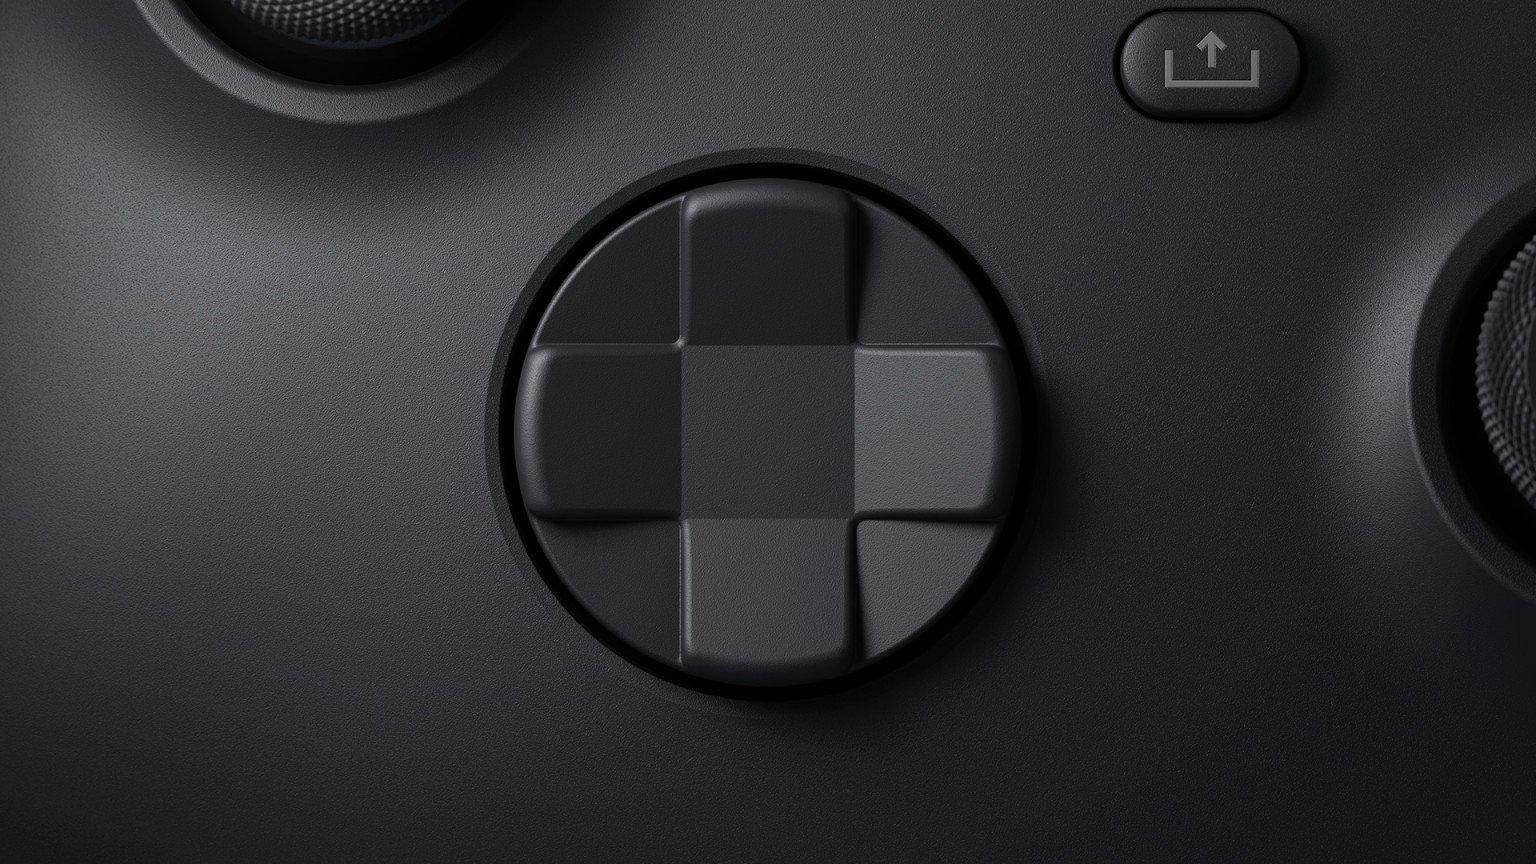 xbox-series-x-d-pad.jpg